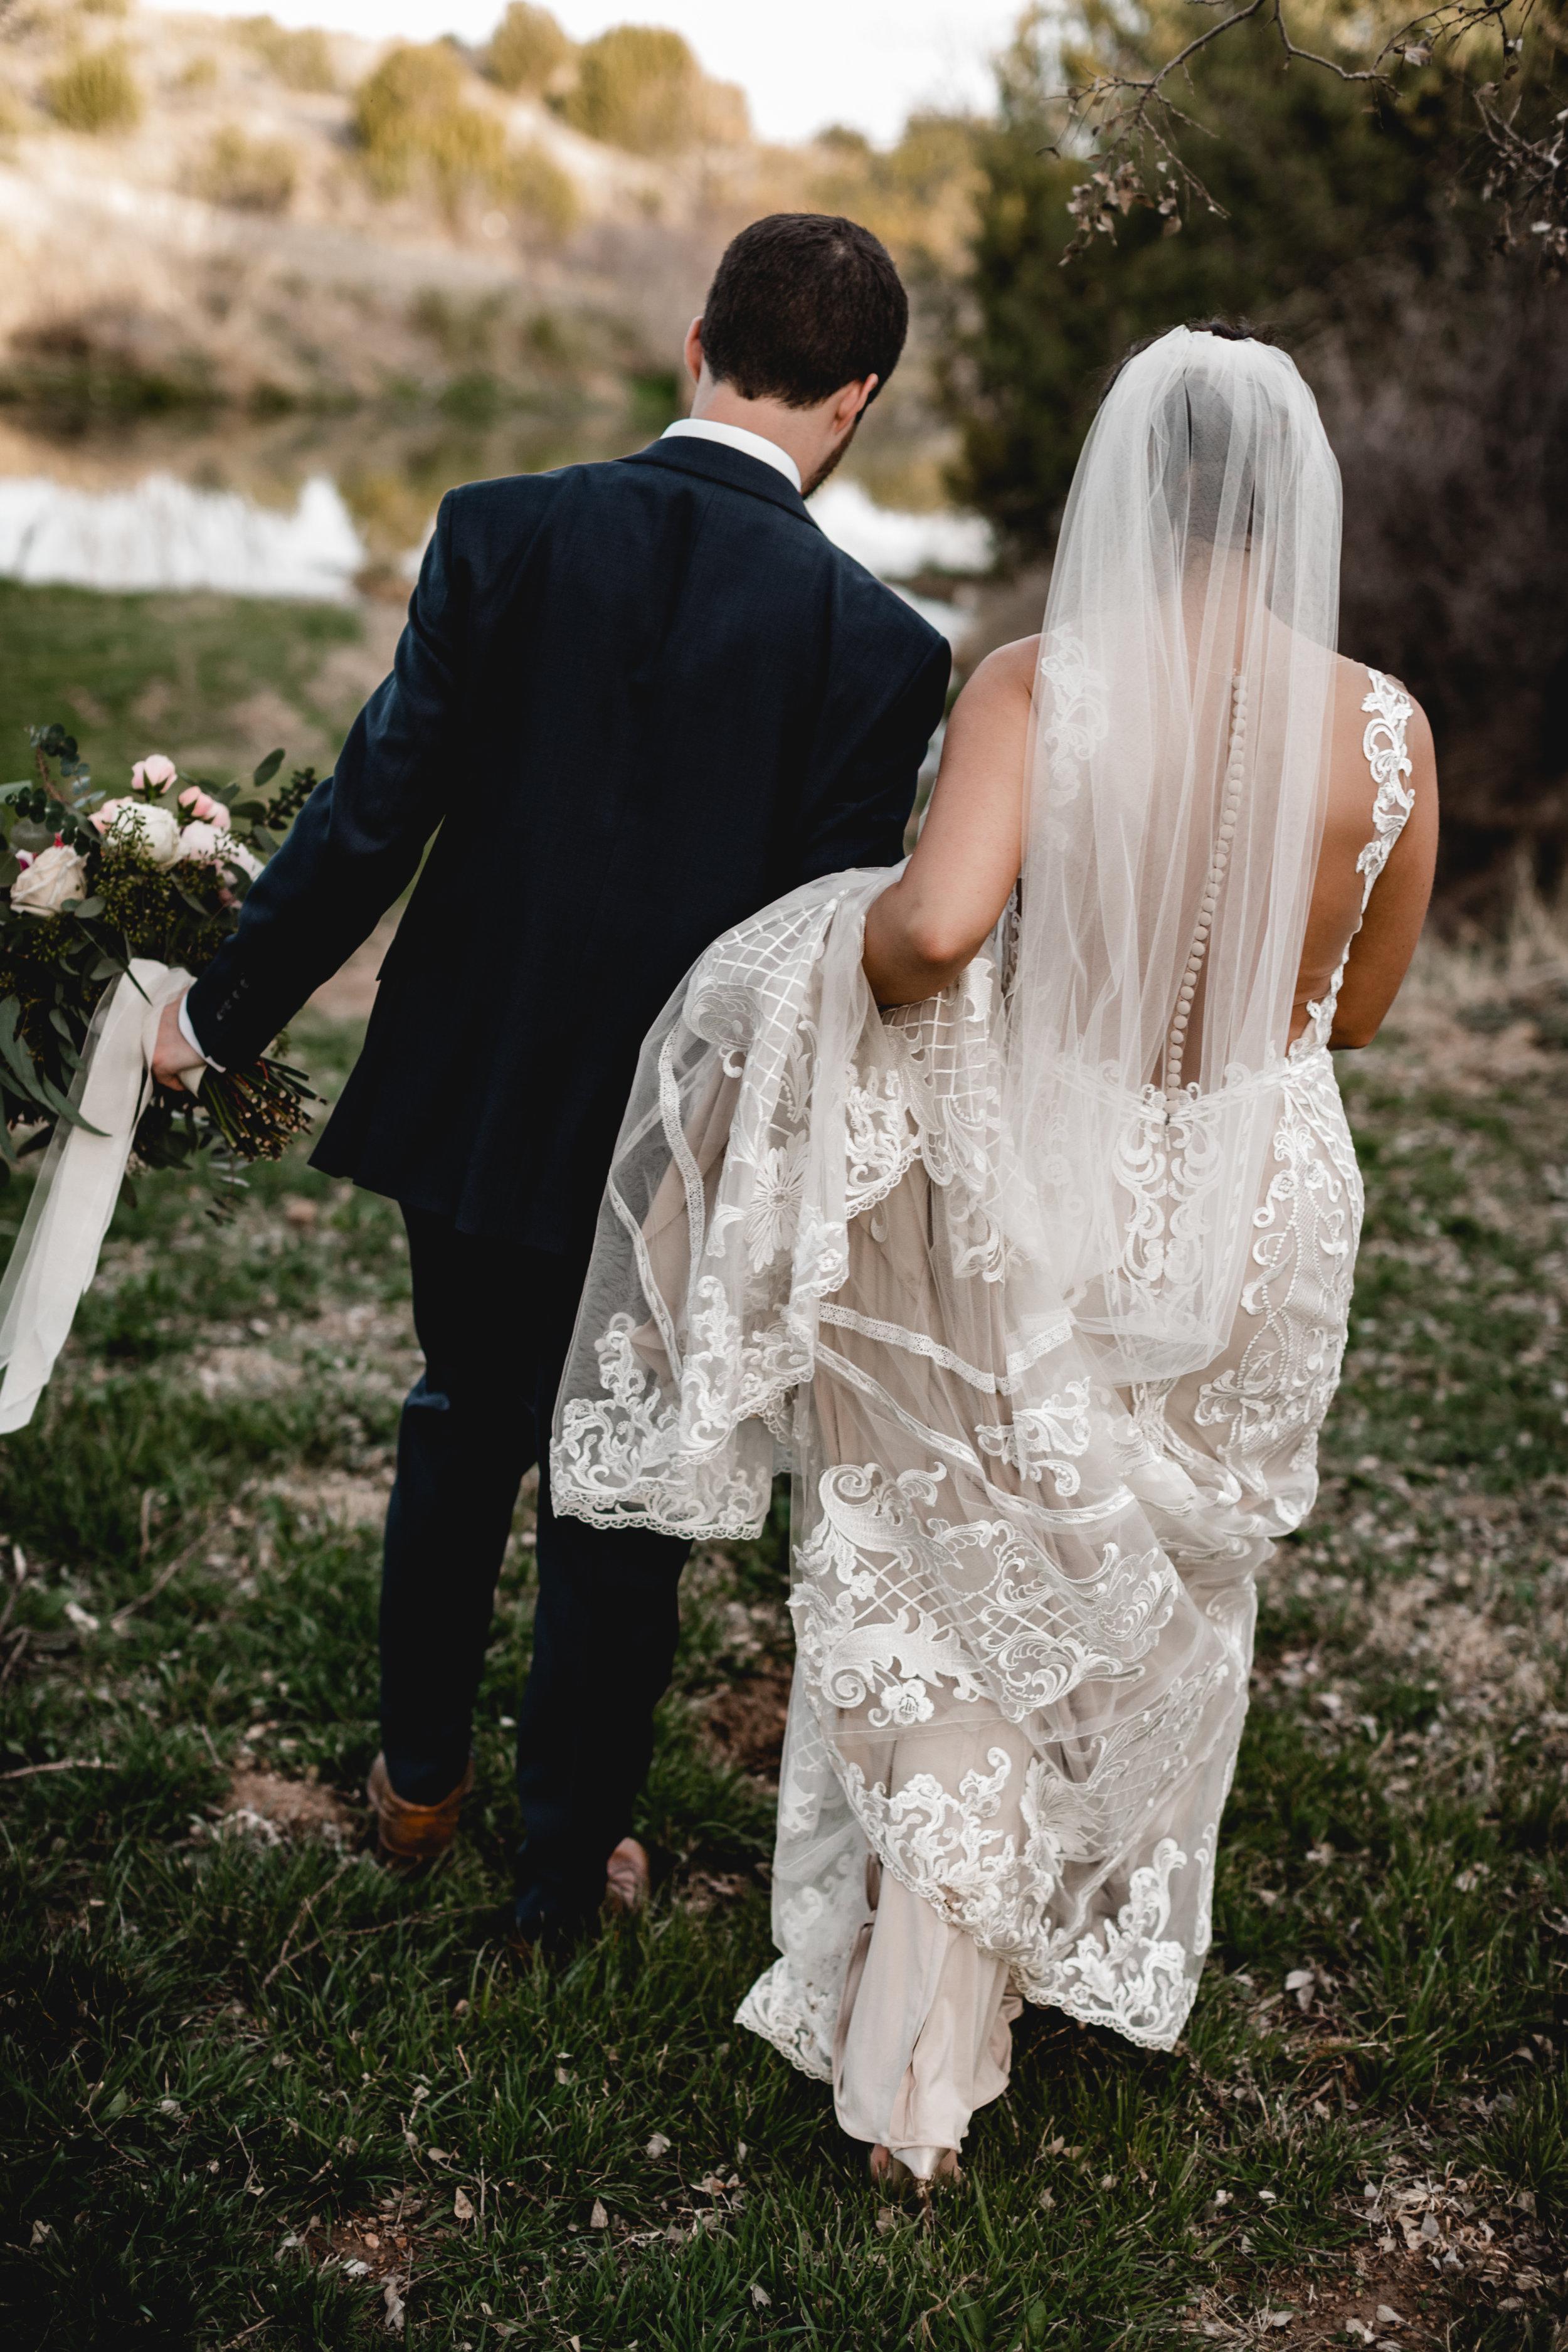 Newlyweds-66.jpg